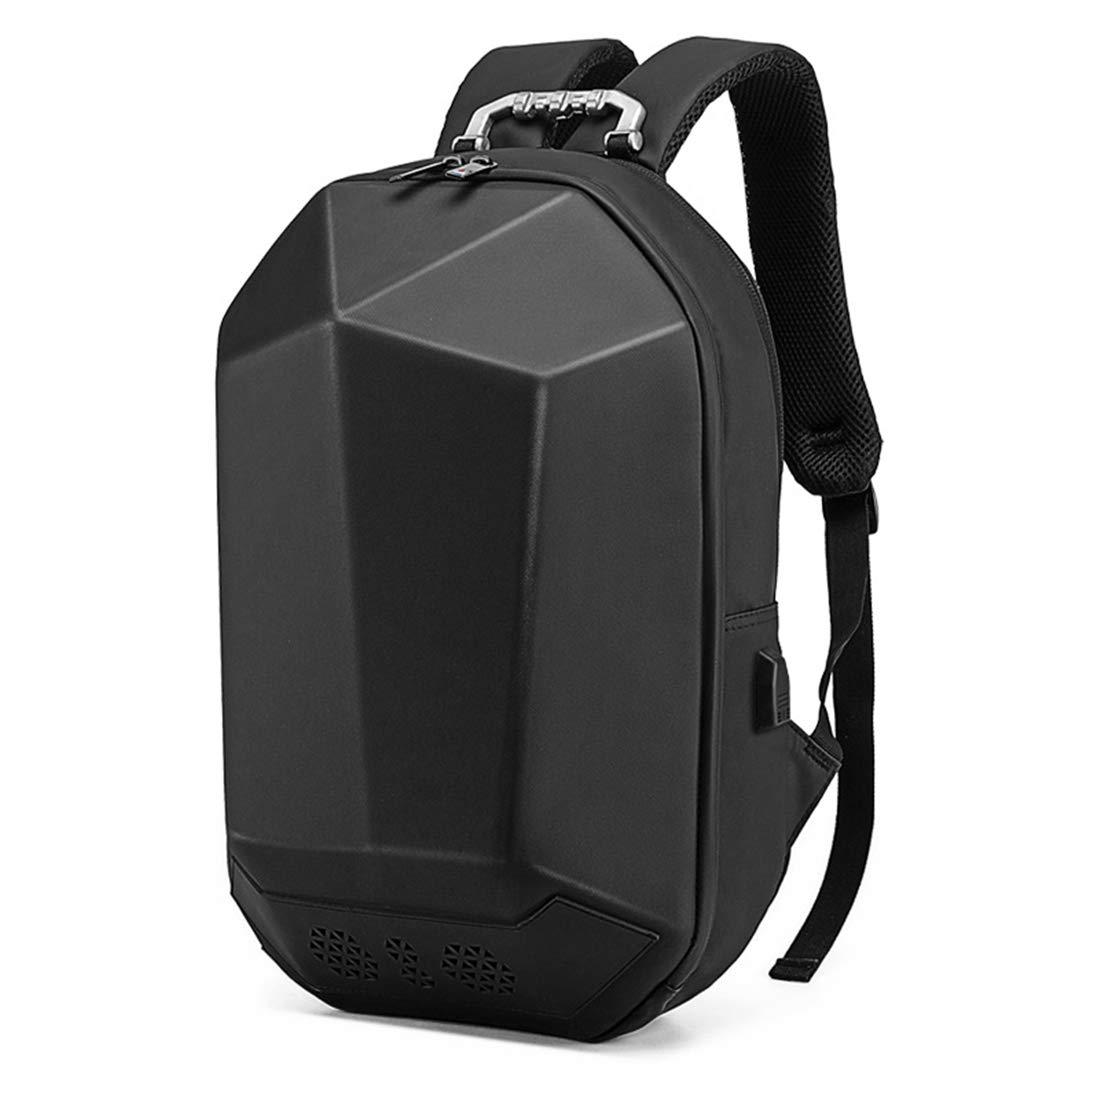 Bluetooth音楽バックパックステレオバックパック防水性の学生用バッグスマート充電用のカレッジバッグ旅行用  Black B07M9BMWSC